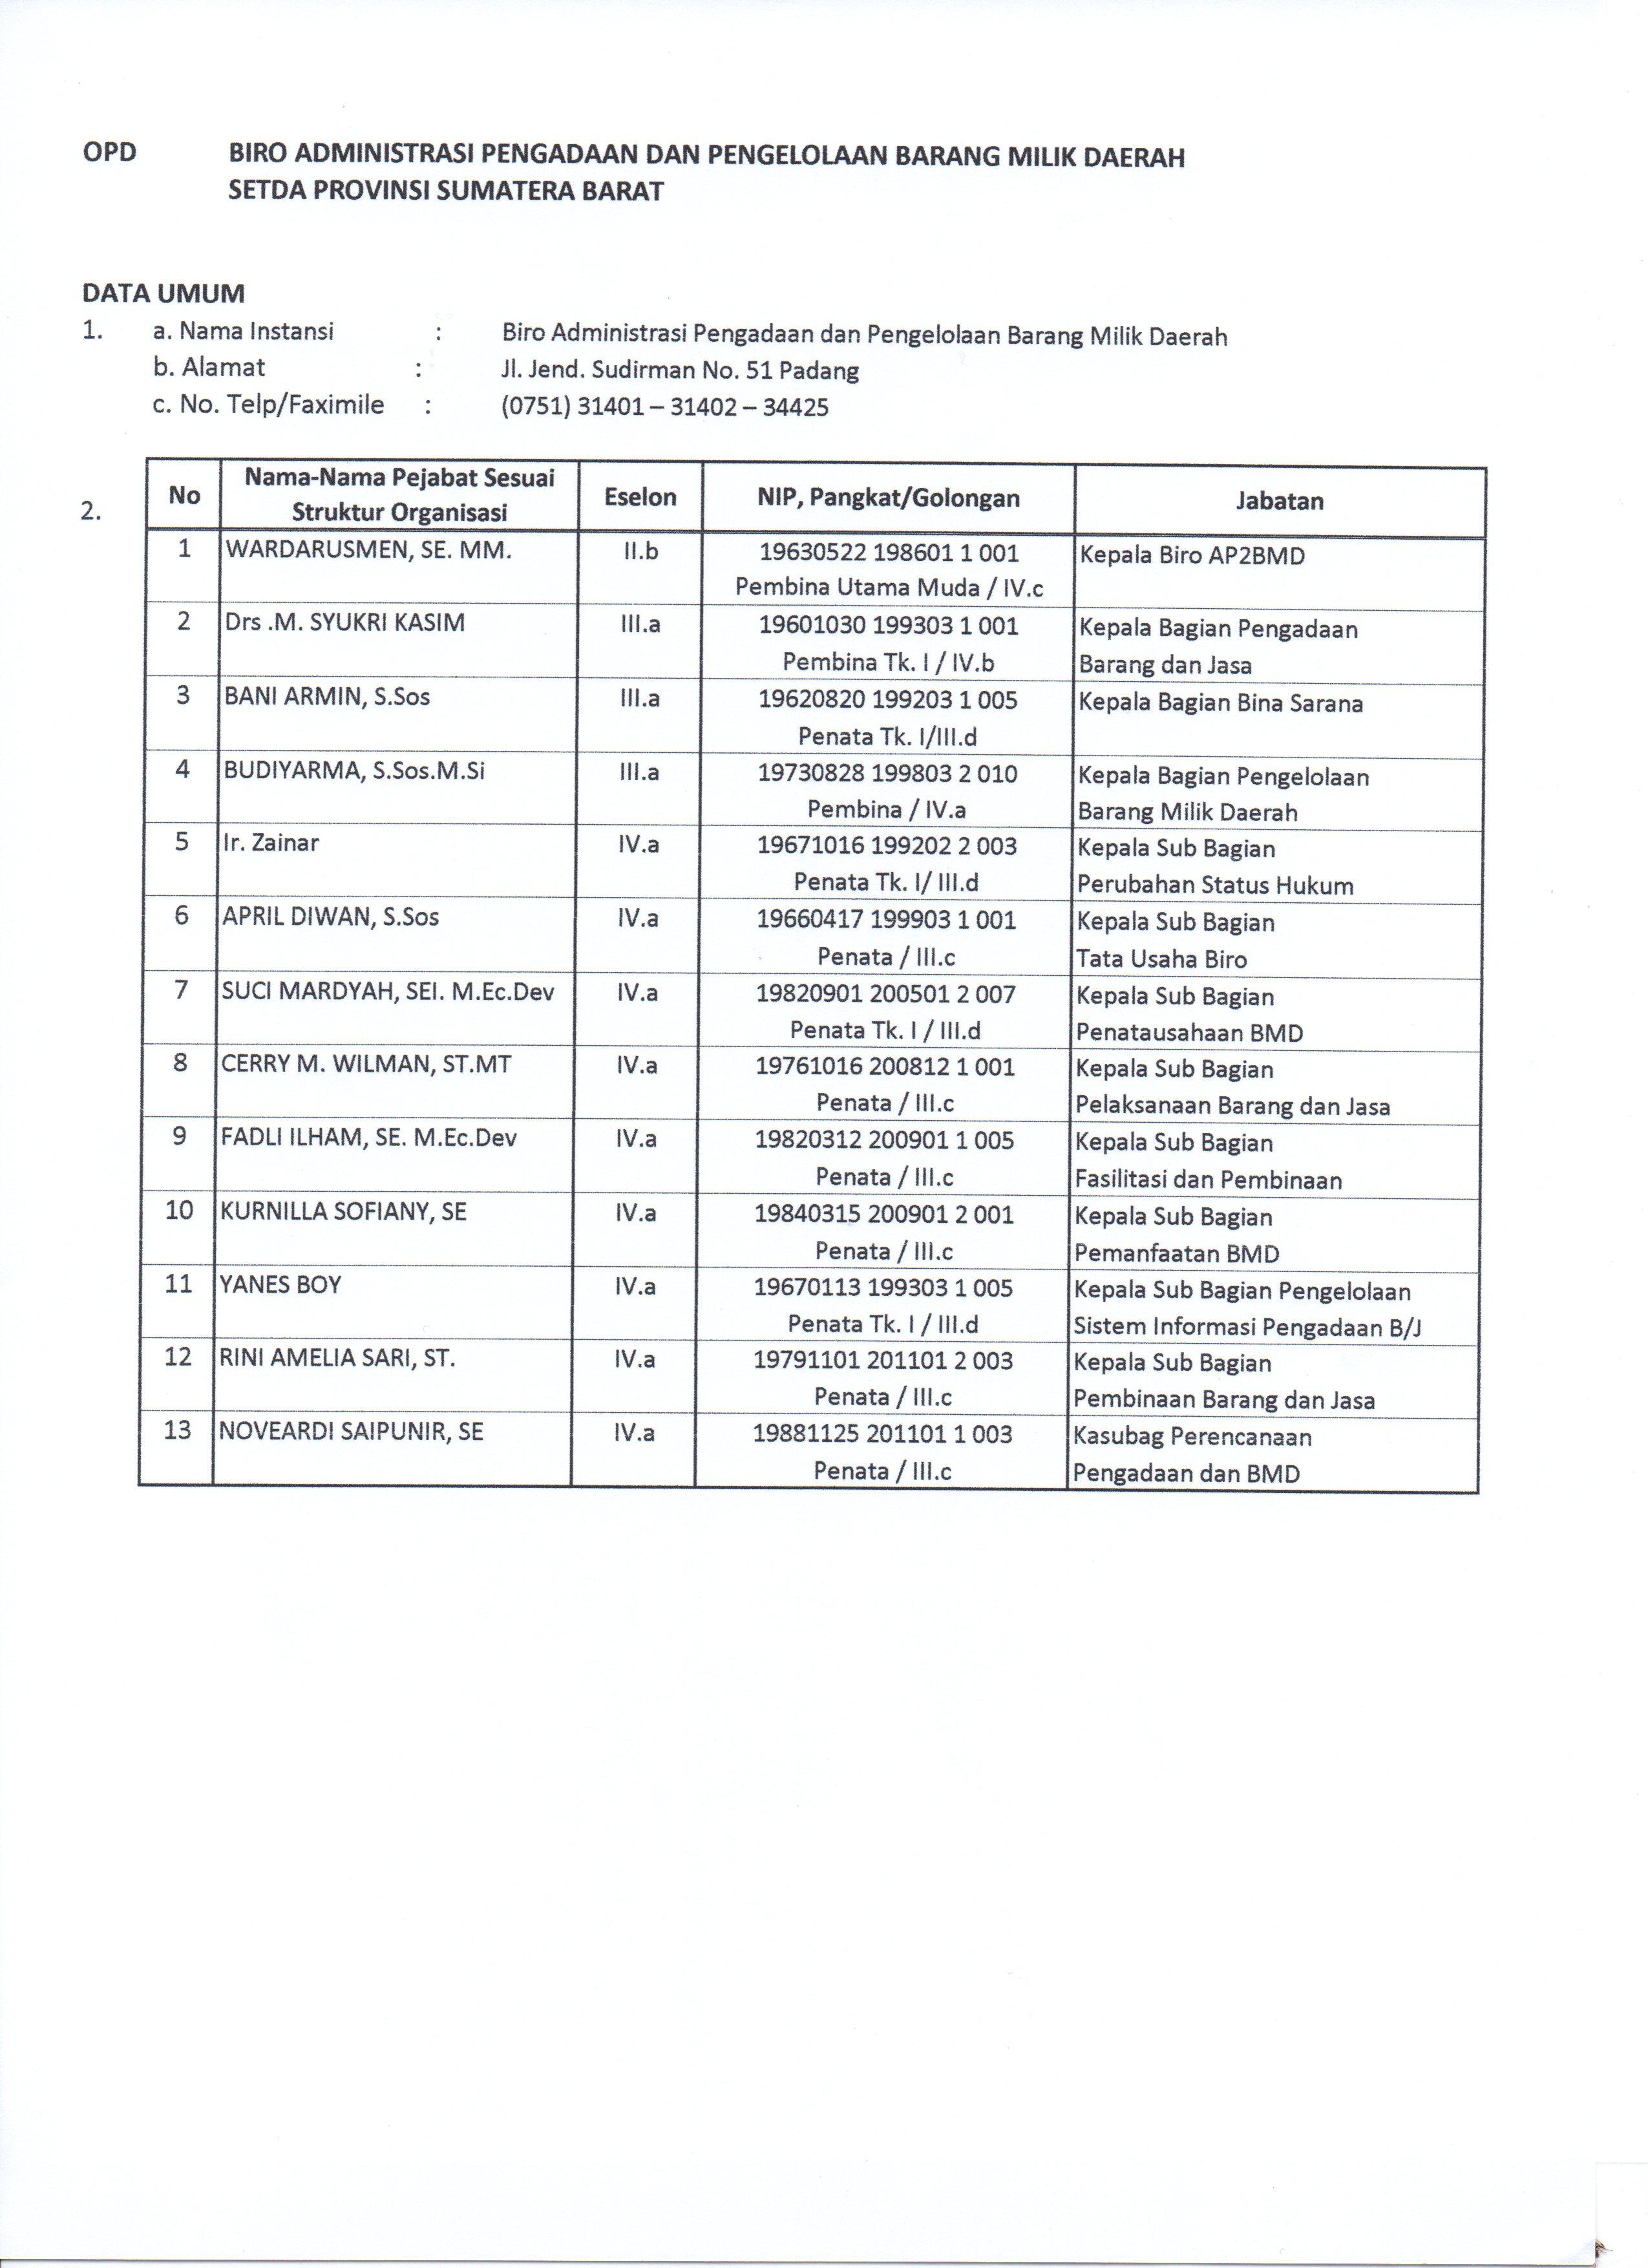 Data Pejabat Struktural Biro AP2BMD Setda Provinsi Sumatera Barat